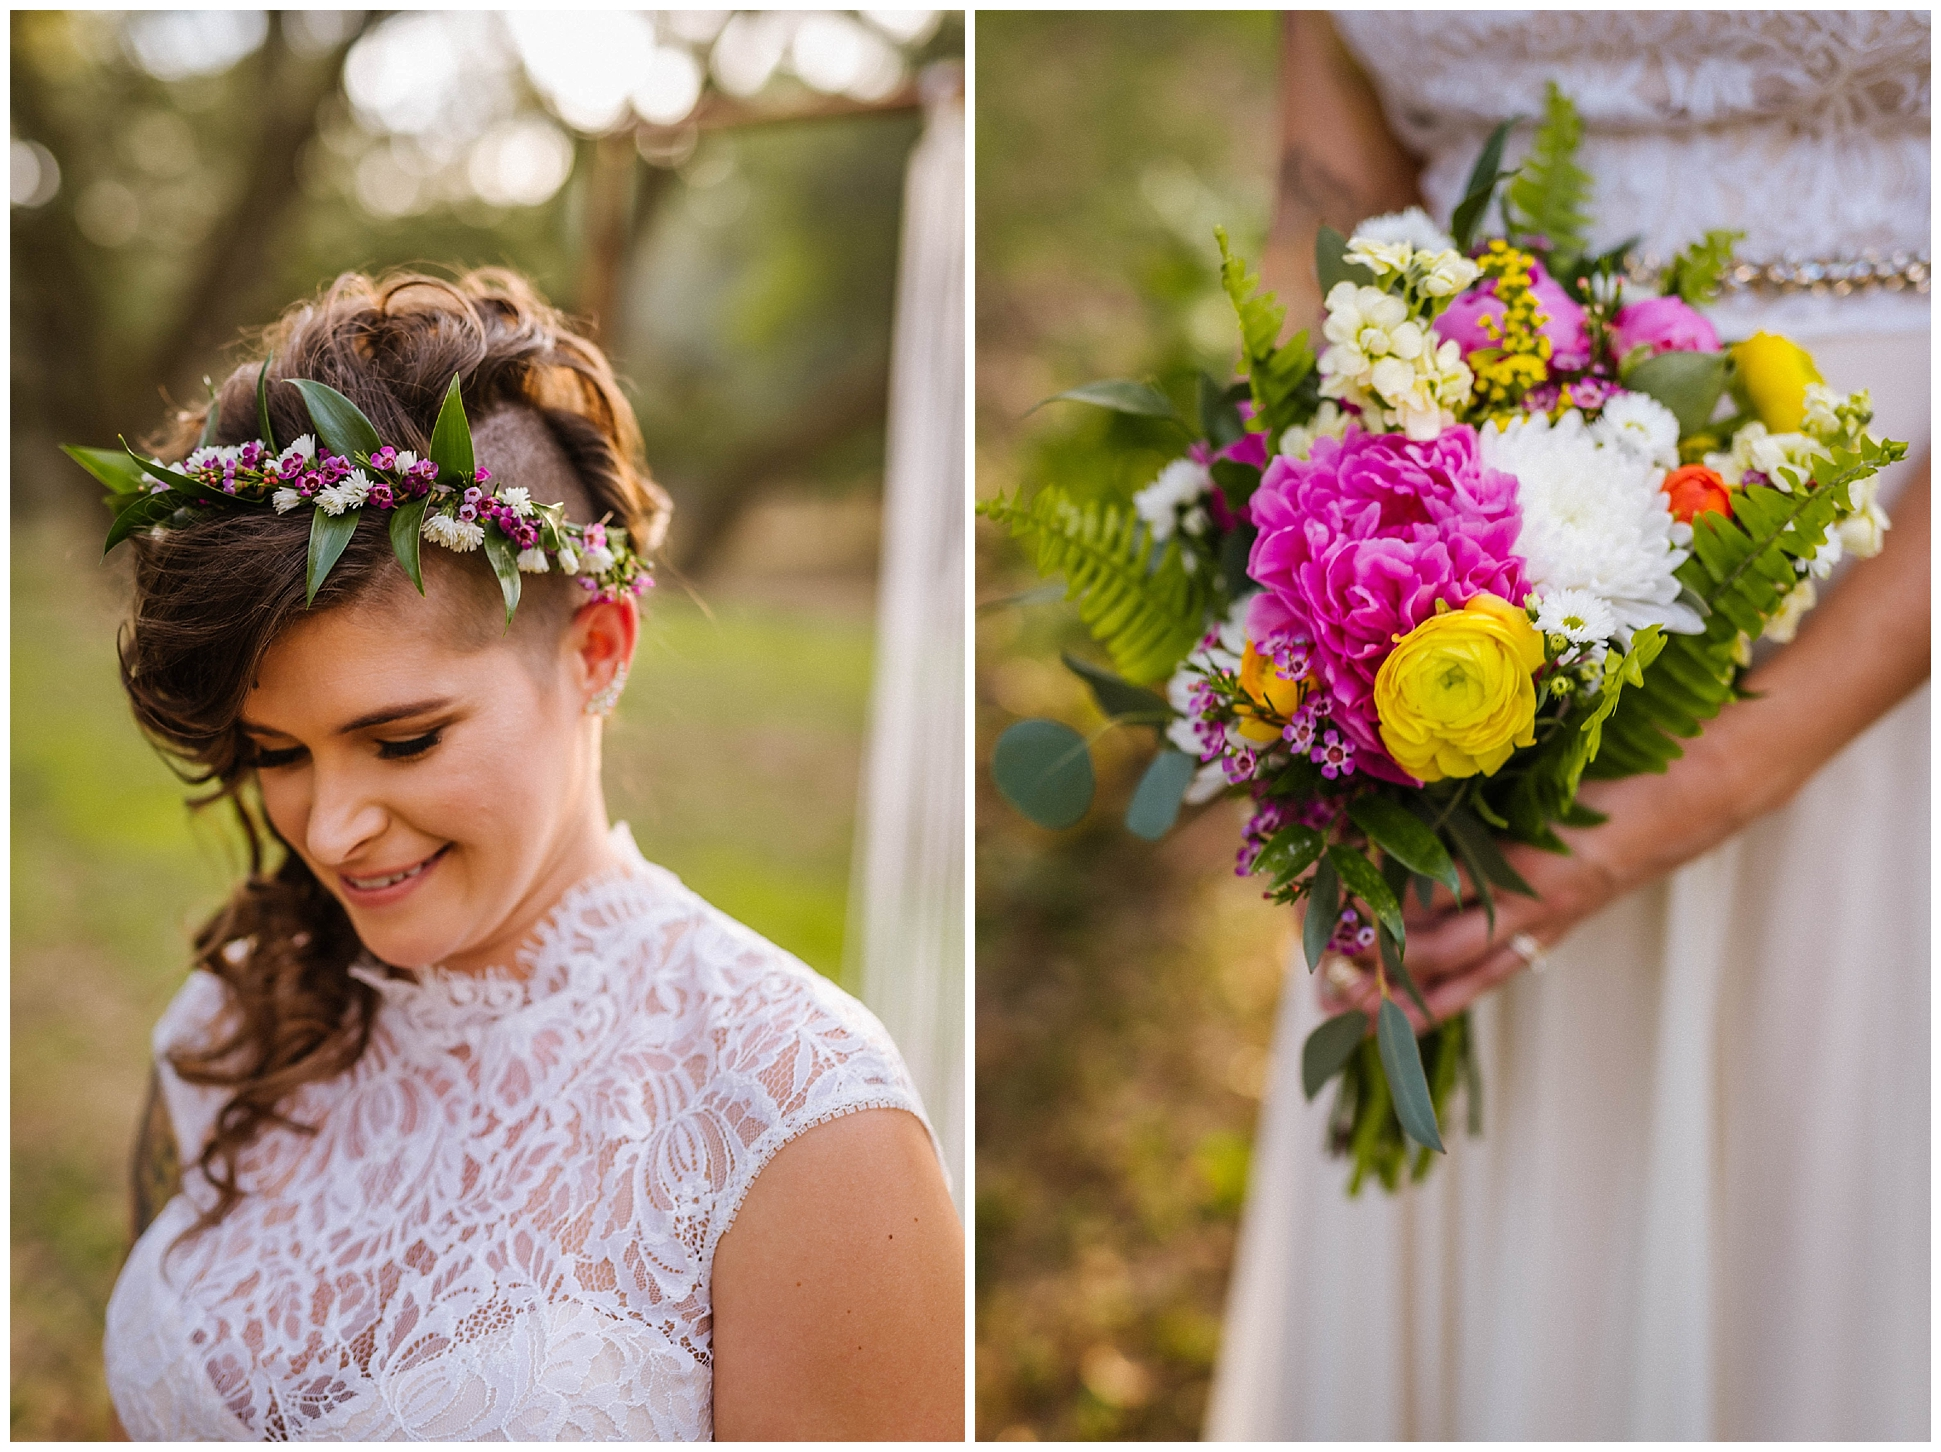 magical-outdoor-florida-wedding-smoke-bombs-flowers-crown-beard_0041.jpg